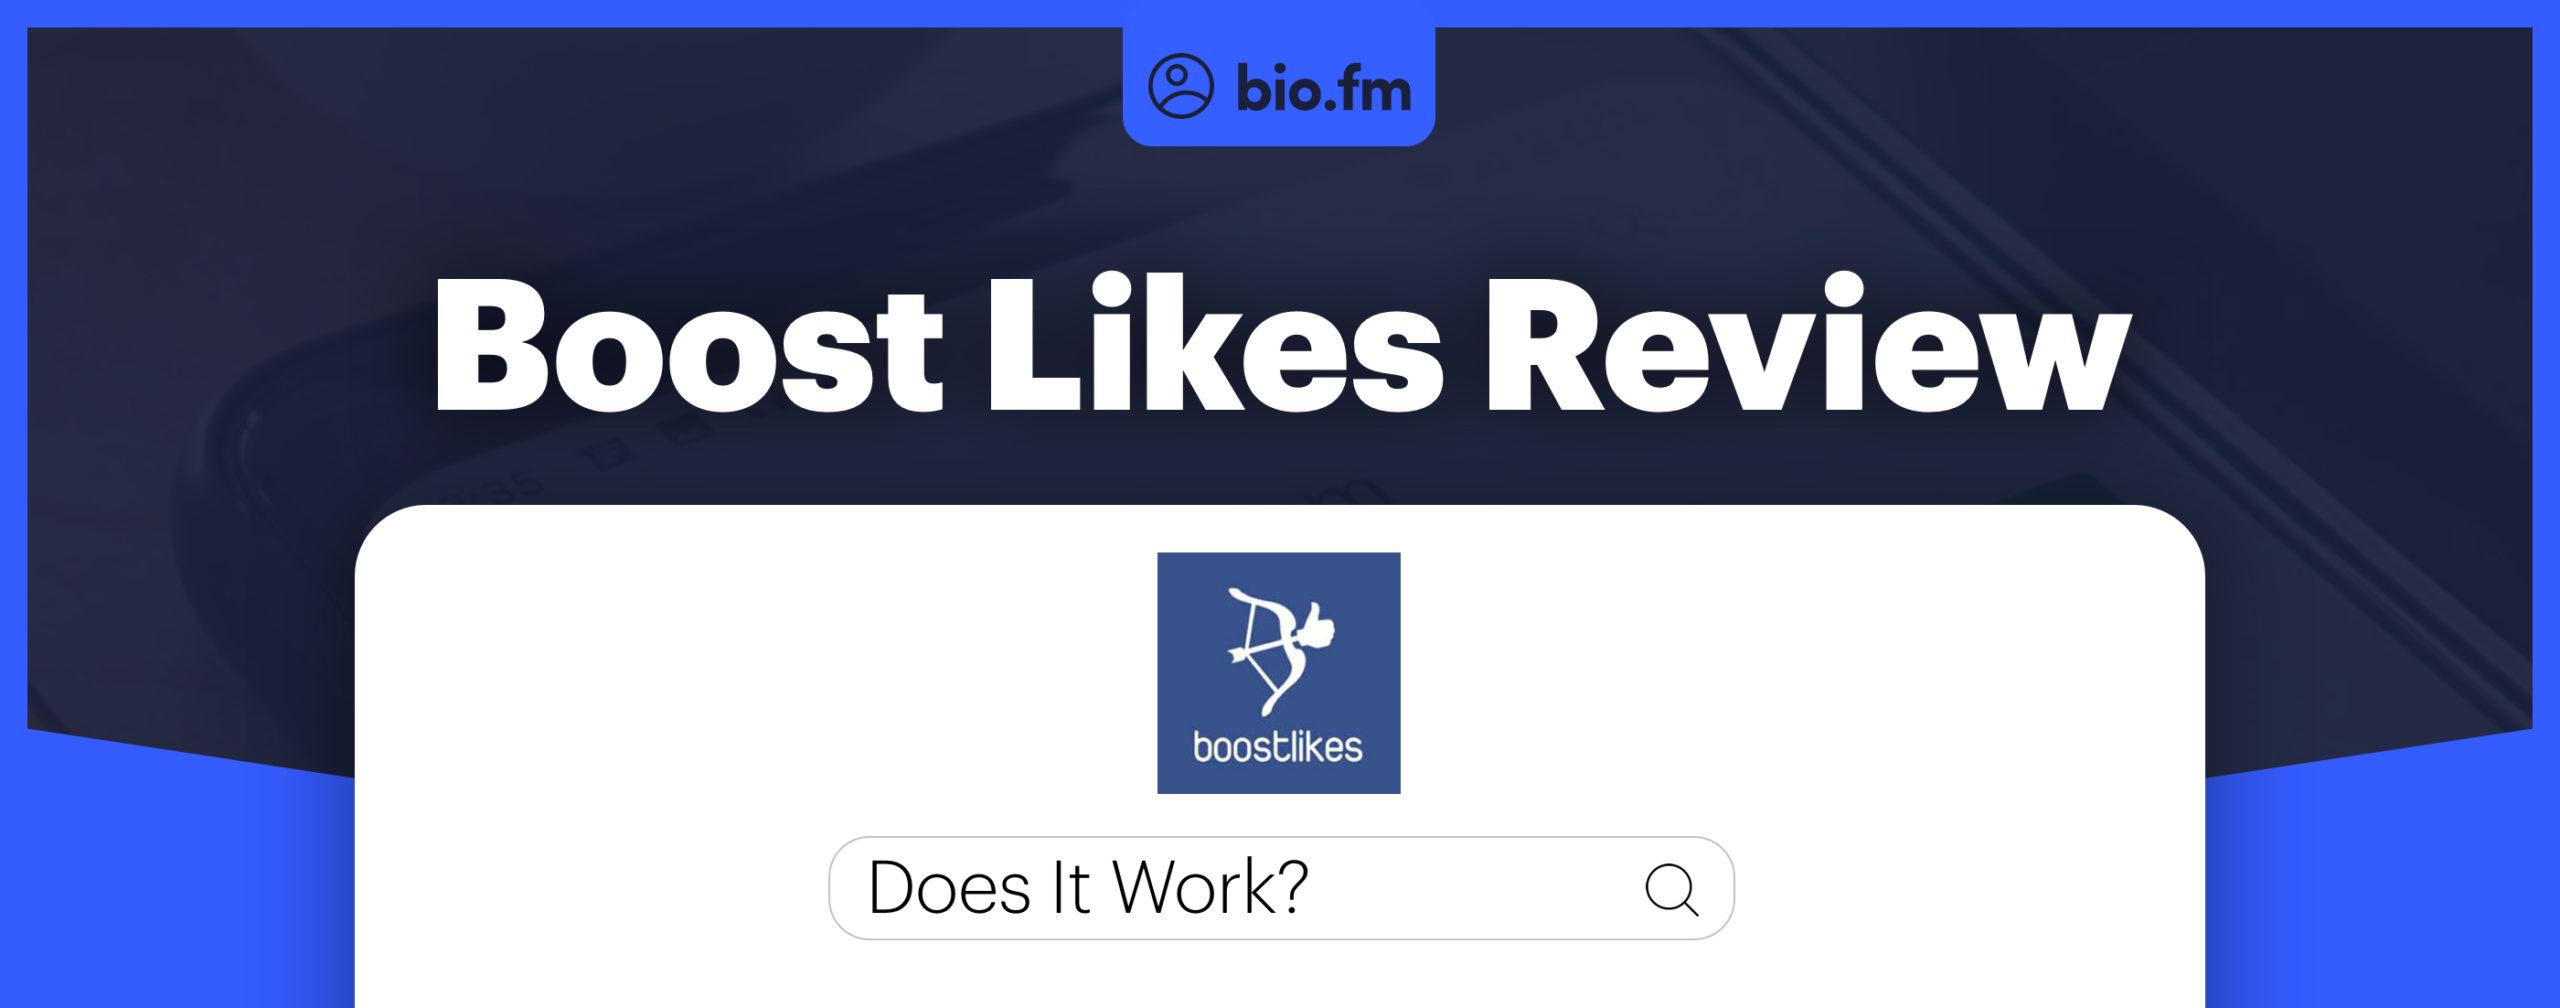 boostlikes featured image